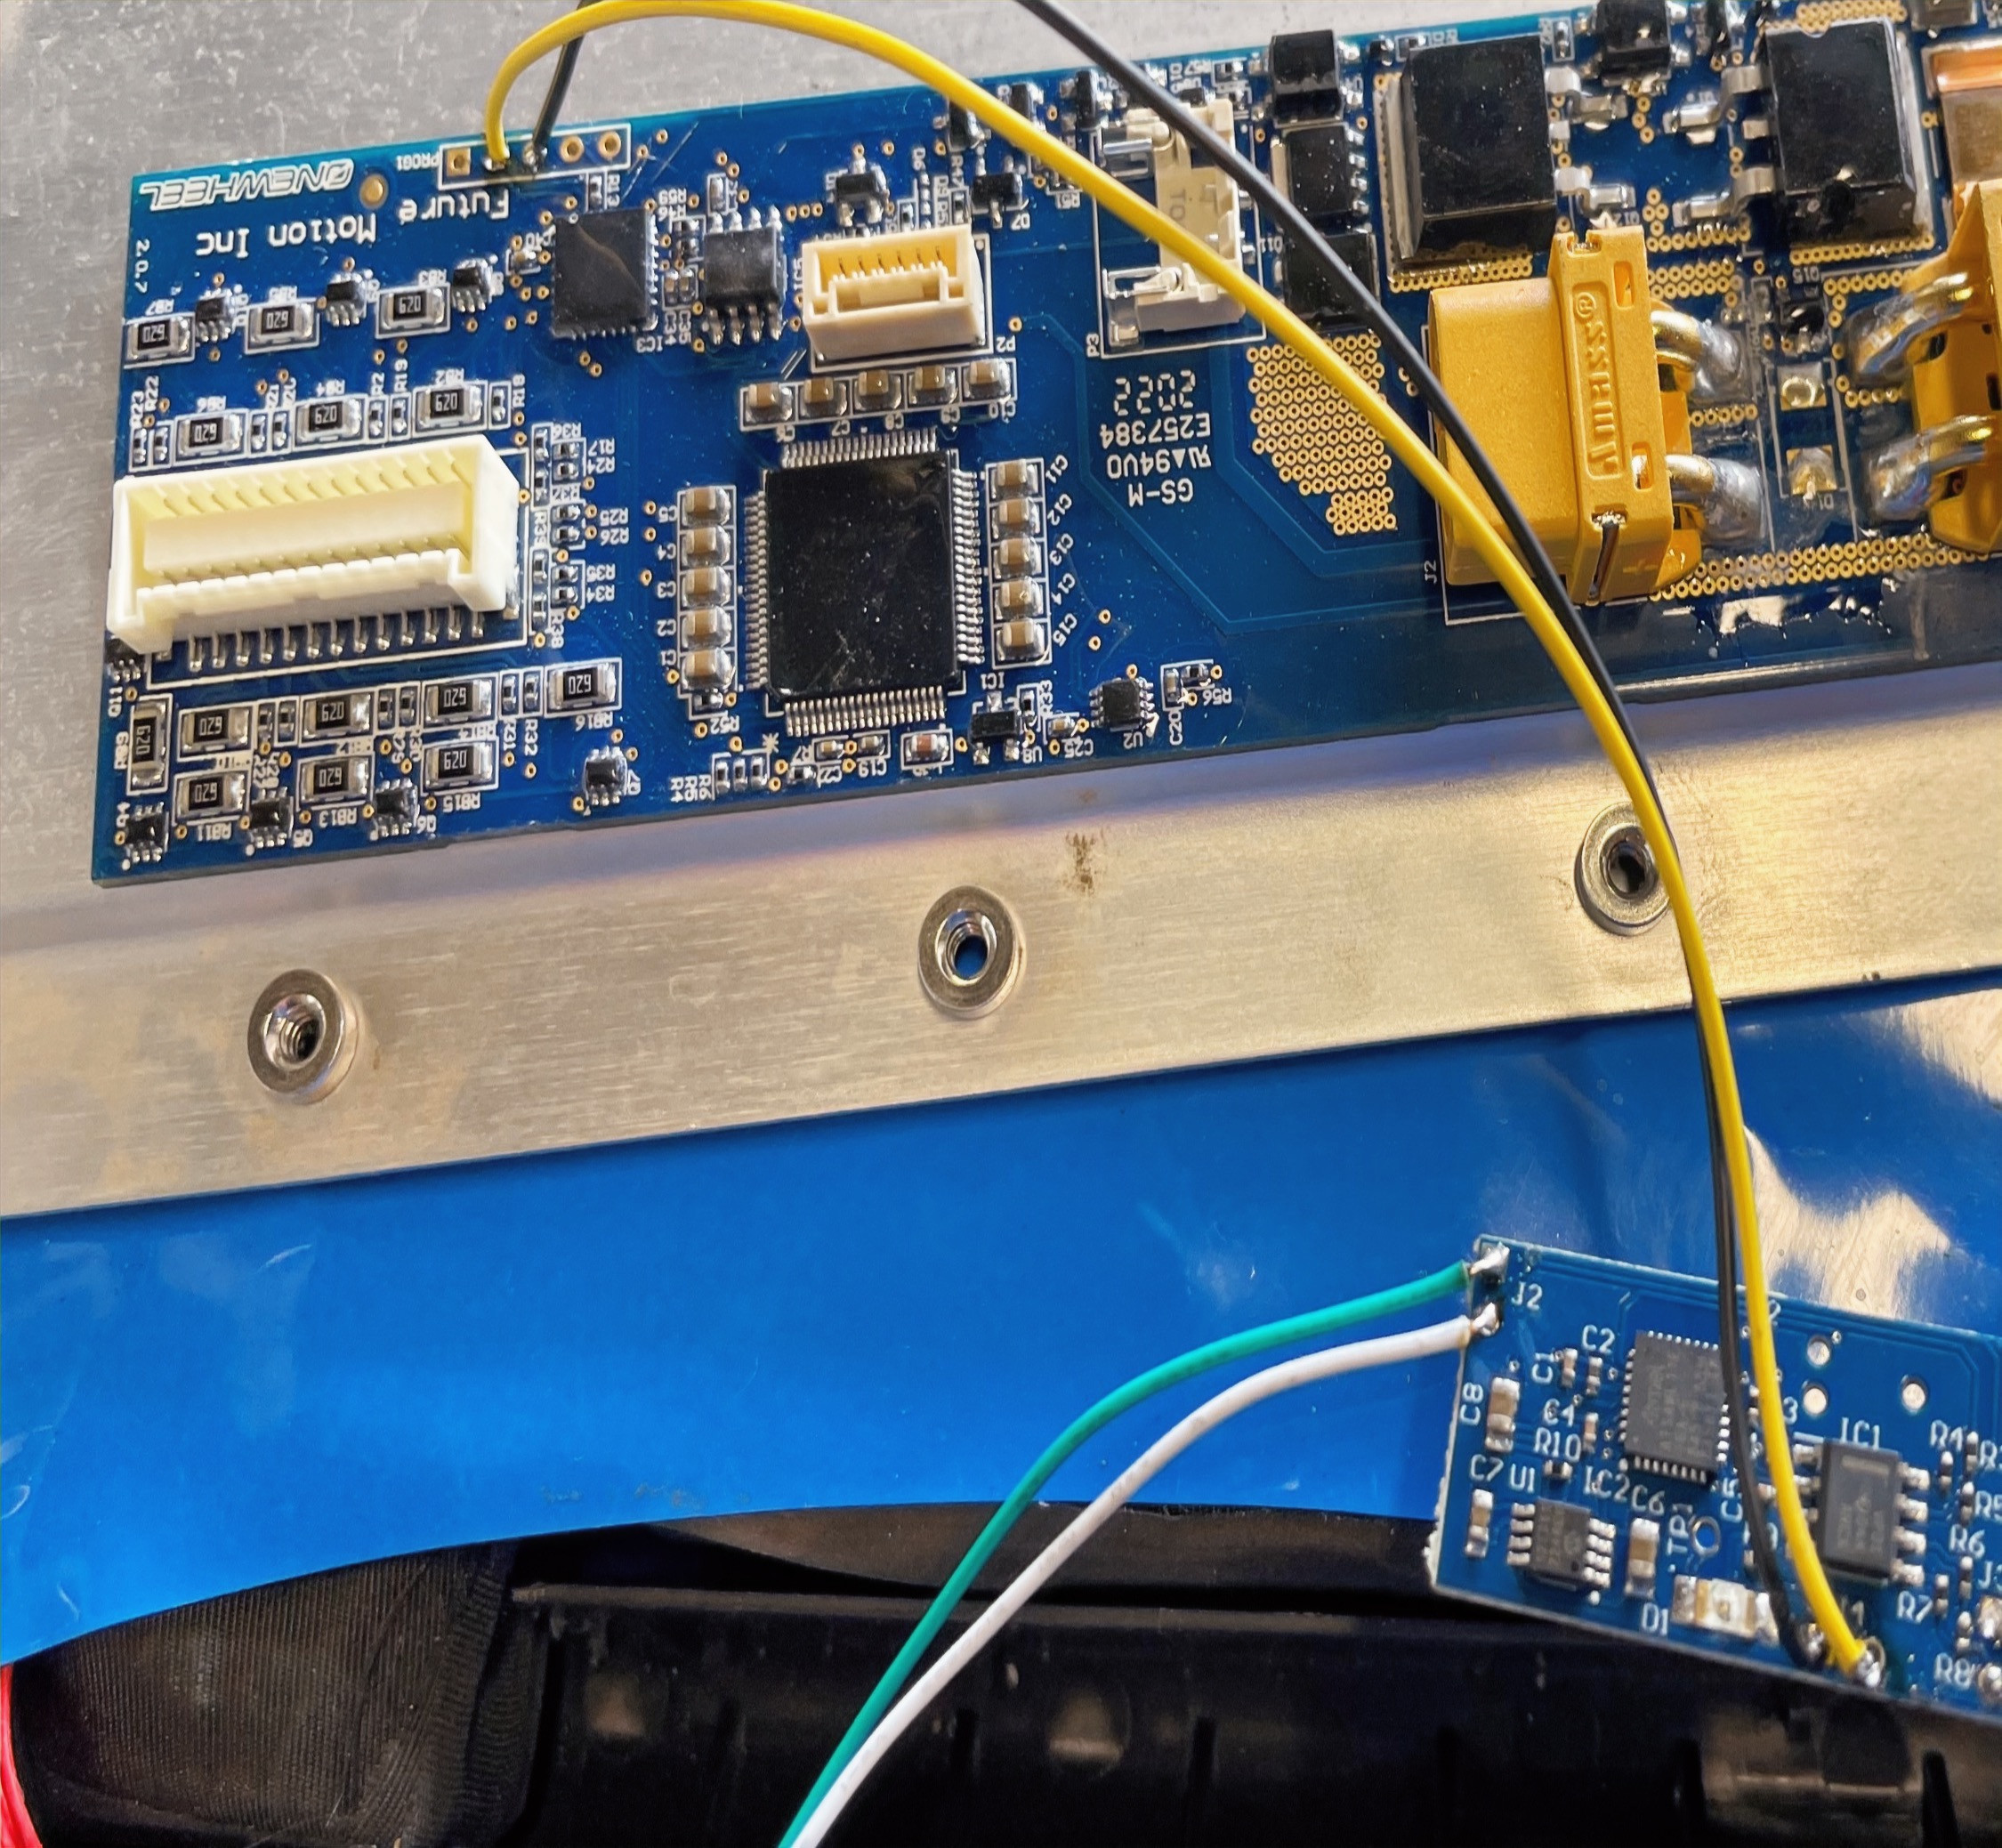 JWFFM Chip Installation and JWXR Battery